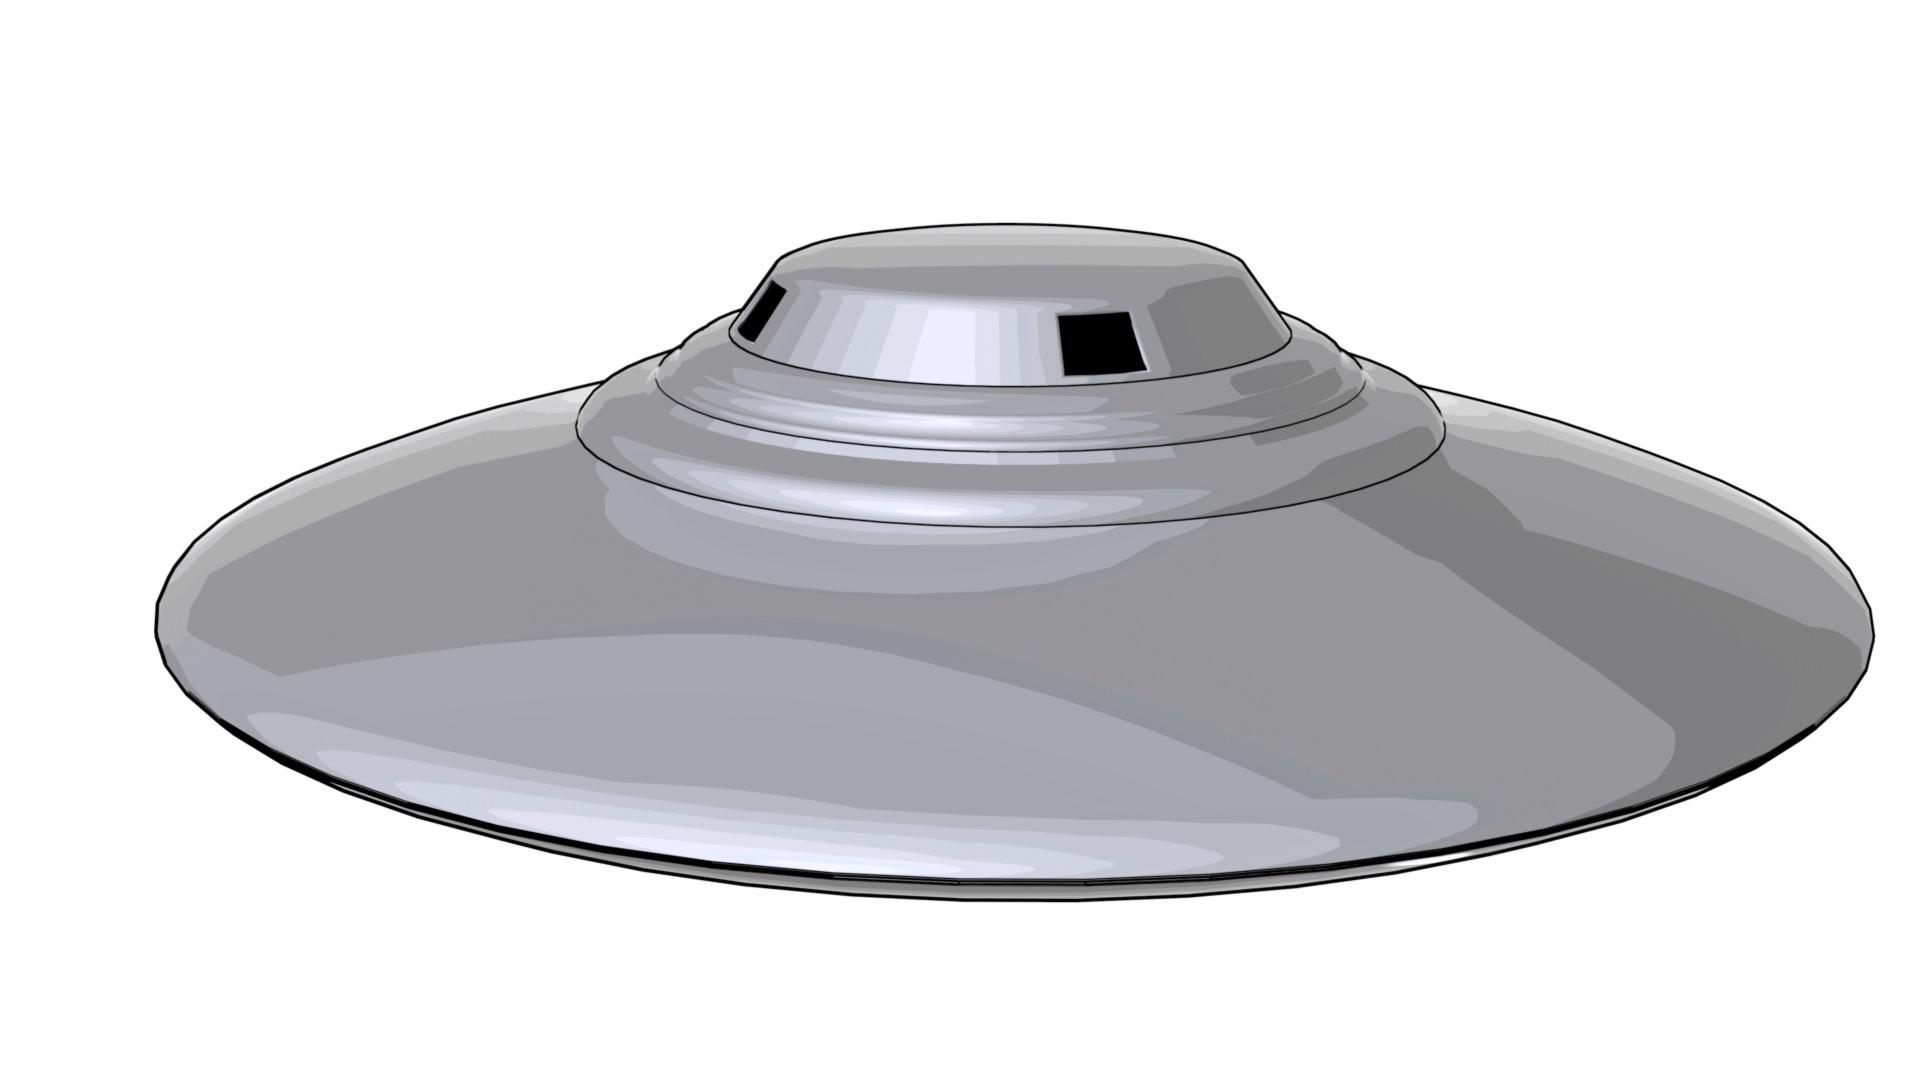 Ufo Classic Flying Saucer Vray 3D Model max obj 3ds  : ufoclassicflyingsaucervray3dmodel3dsdwgfbxdxfobjmaxw3df044cdd2 f543 49e8 8098 b1b6f18a8833 from www.cgtrader.com size 1920 x 1080 jpeg 99kB